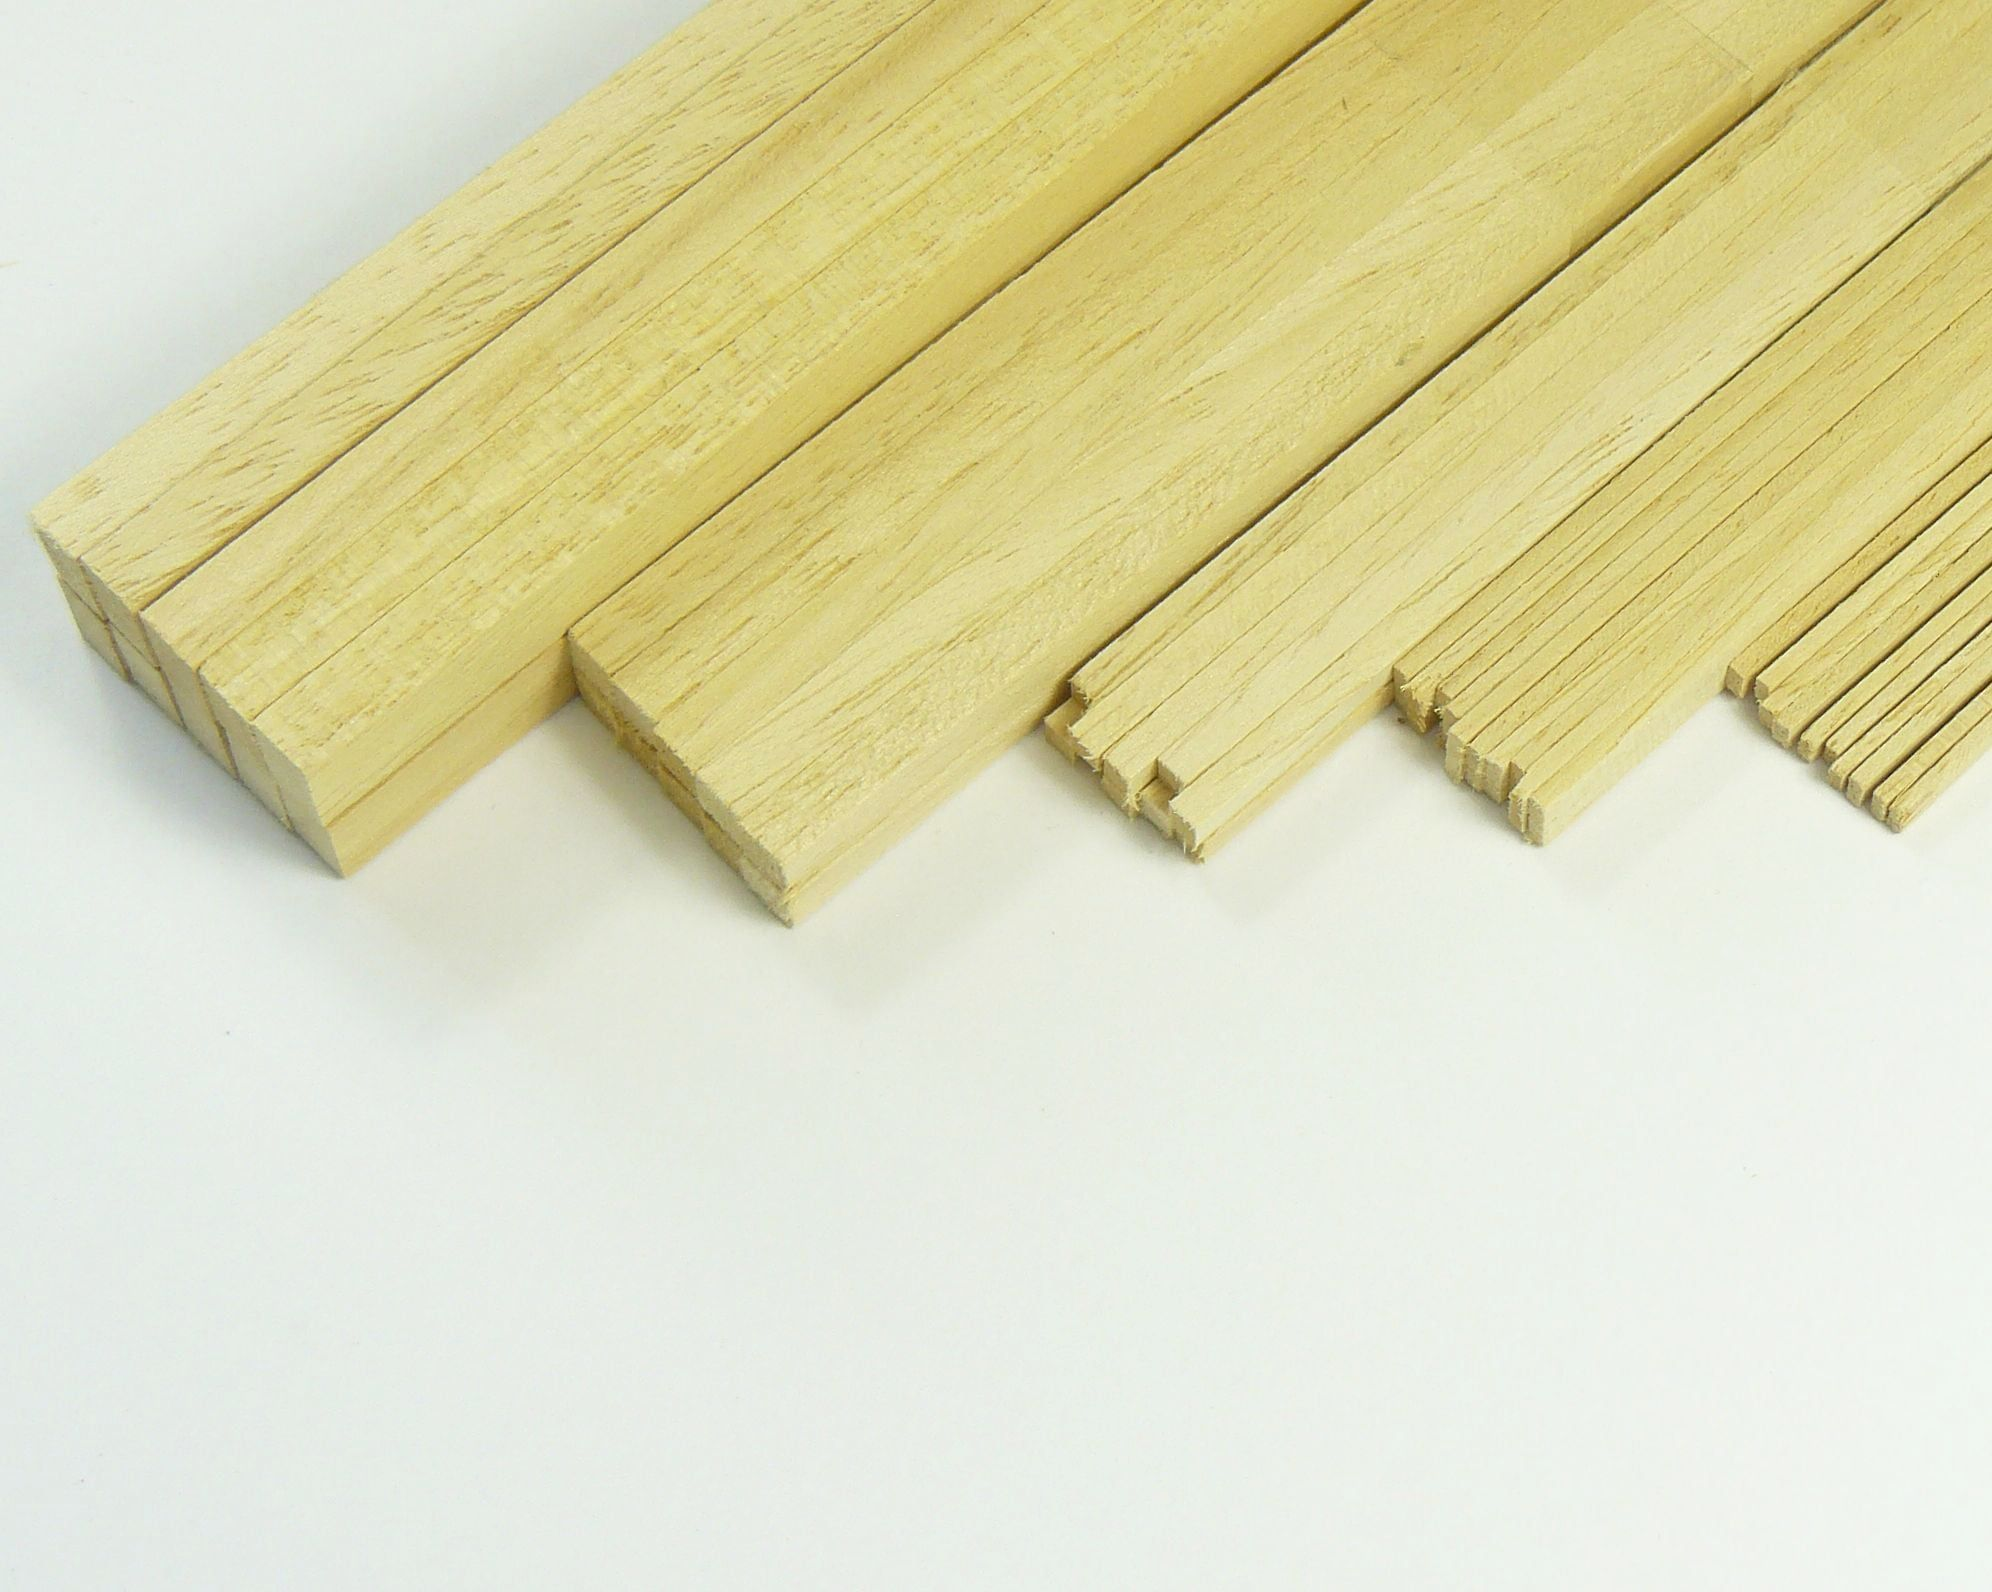 Obeche Stripwood Bundles of 10